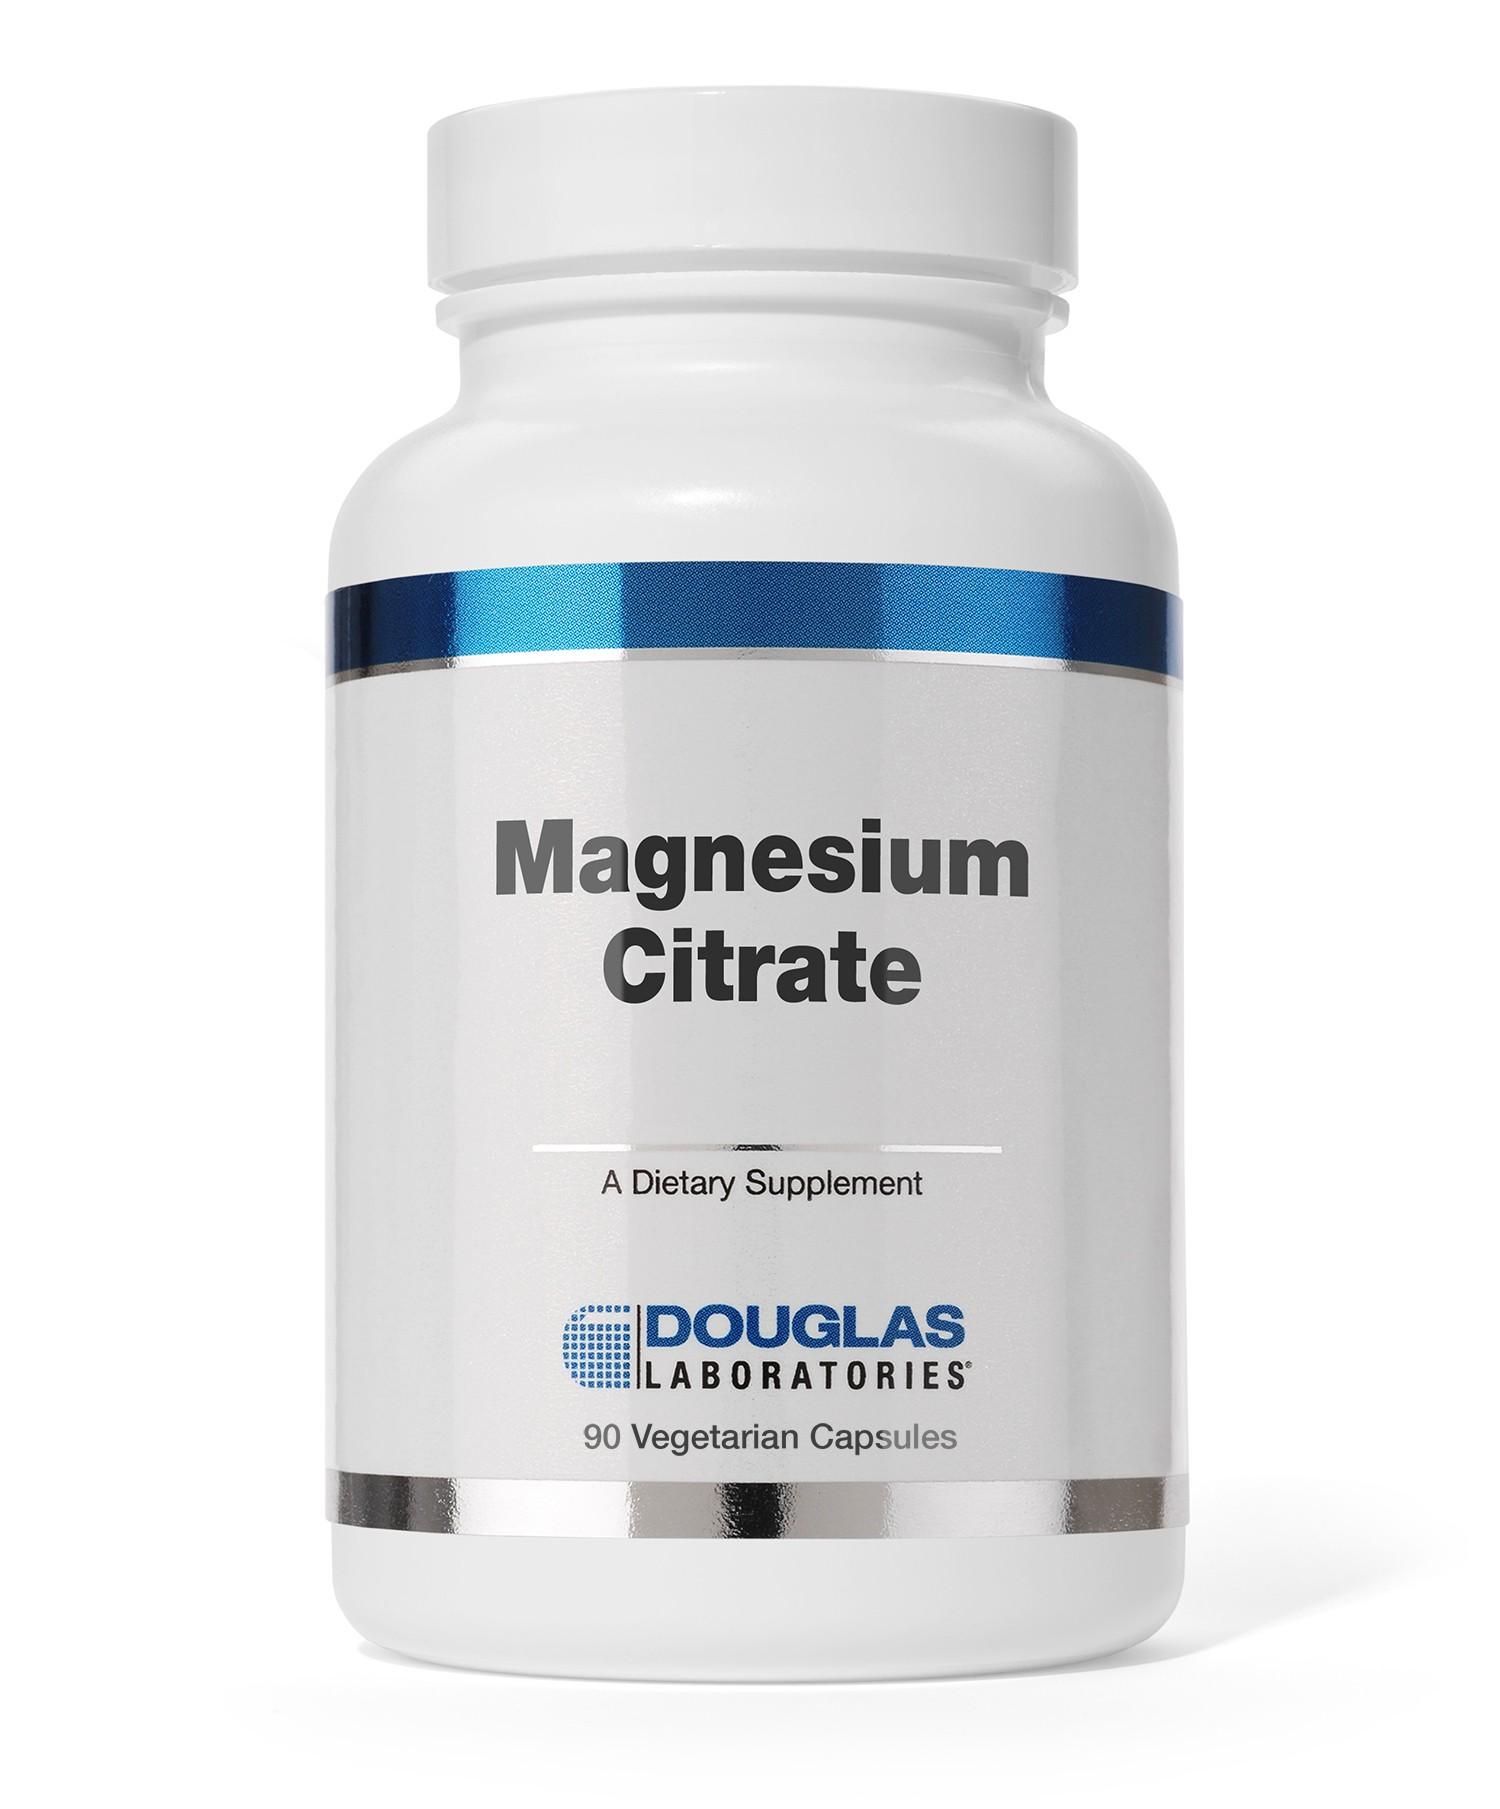 Douglas Labs Magnesium Citrate 90 veg. Kapseln (98g)